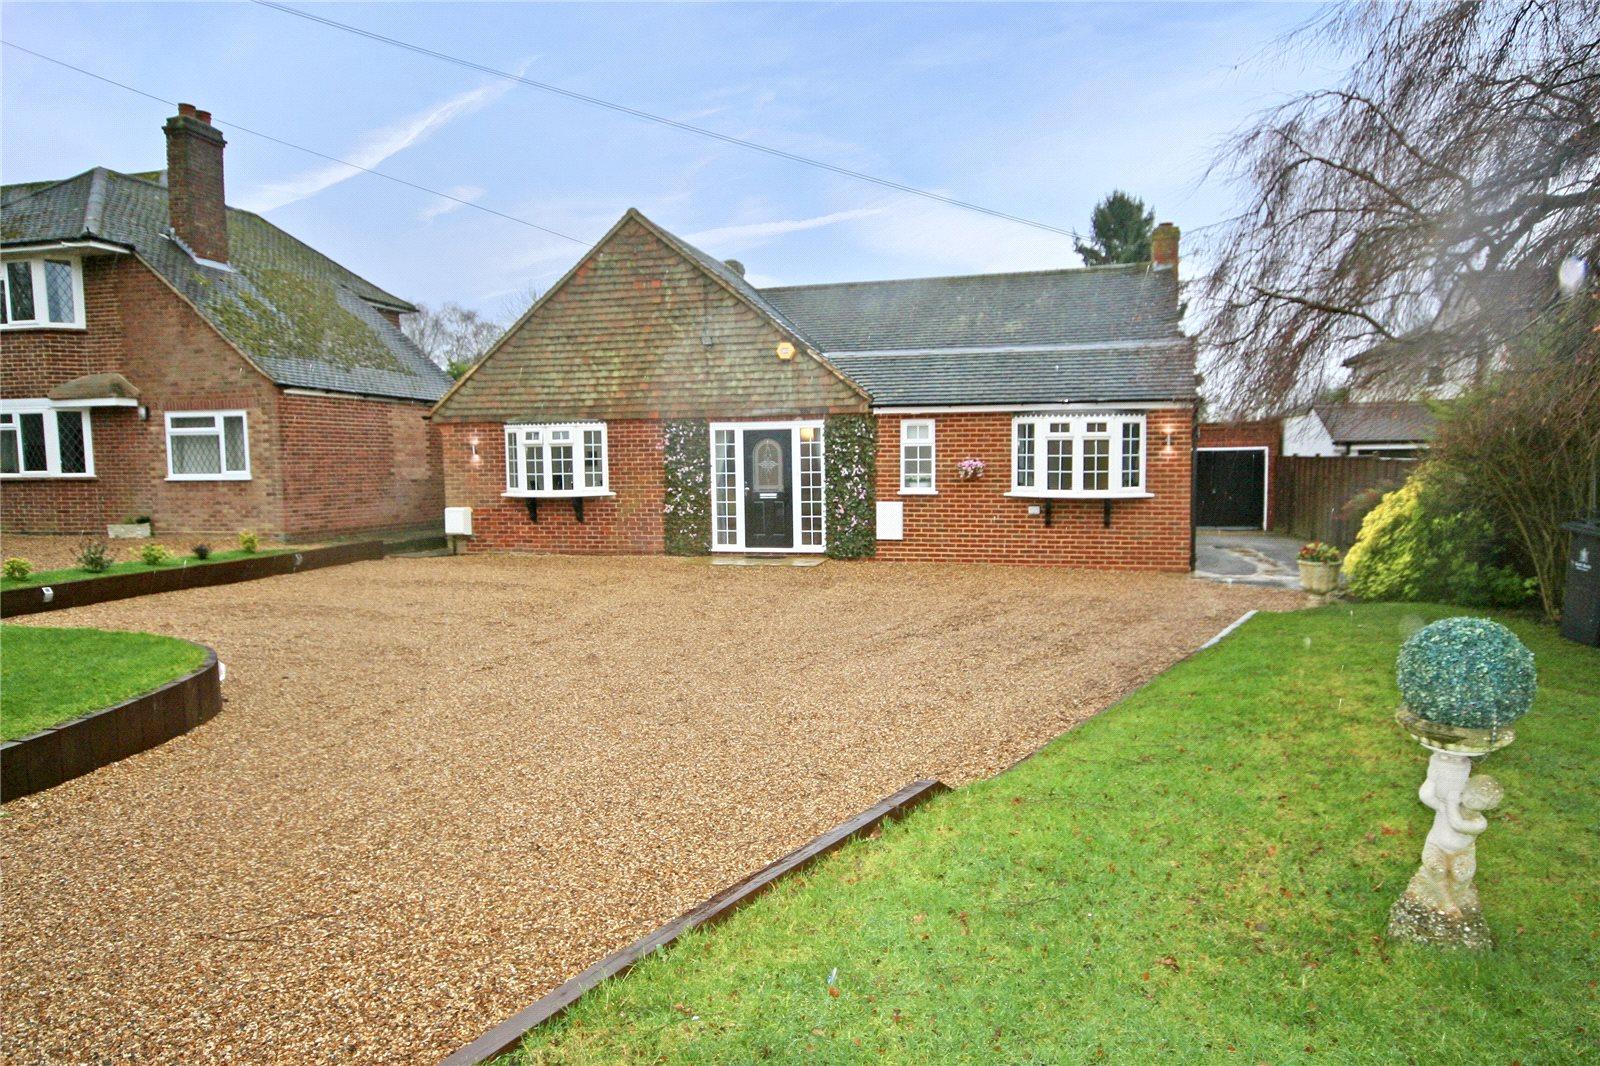 Single Family Home for Sale at Farthing Green Lane, Stoke Poges, Buckinghamshire, SL2 Stoke Poges, England